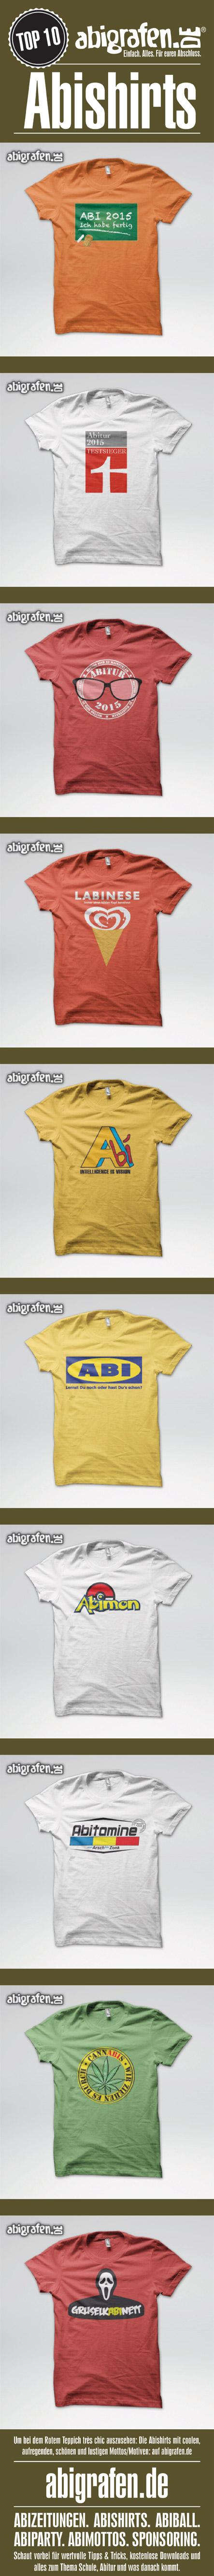 #Abishirts #Tshirts #Abschlussshirts #Abishirt #T-Shirt #Abikleidung #Abifashion #abigrafentop10